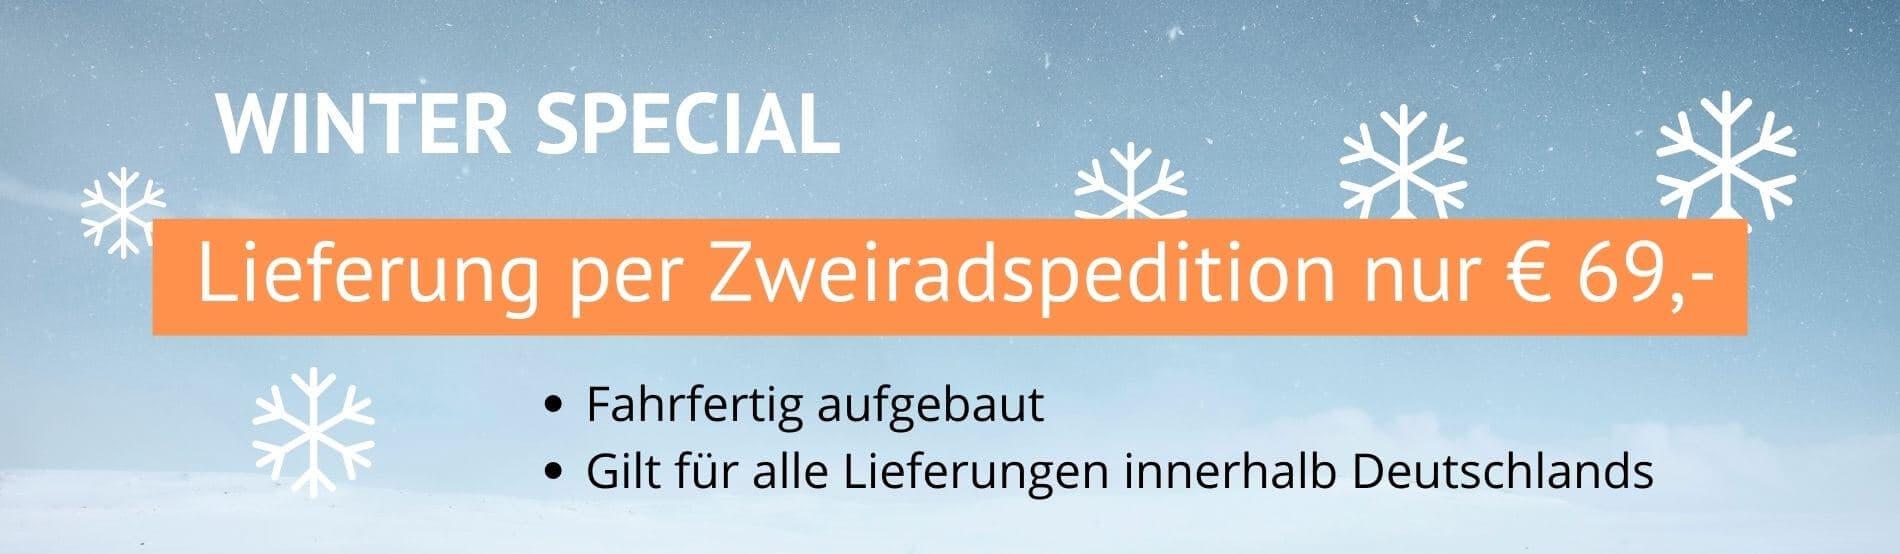 Winterspecial Lieferung